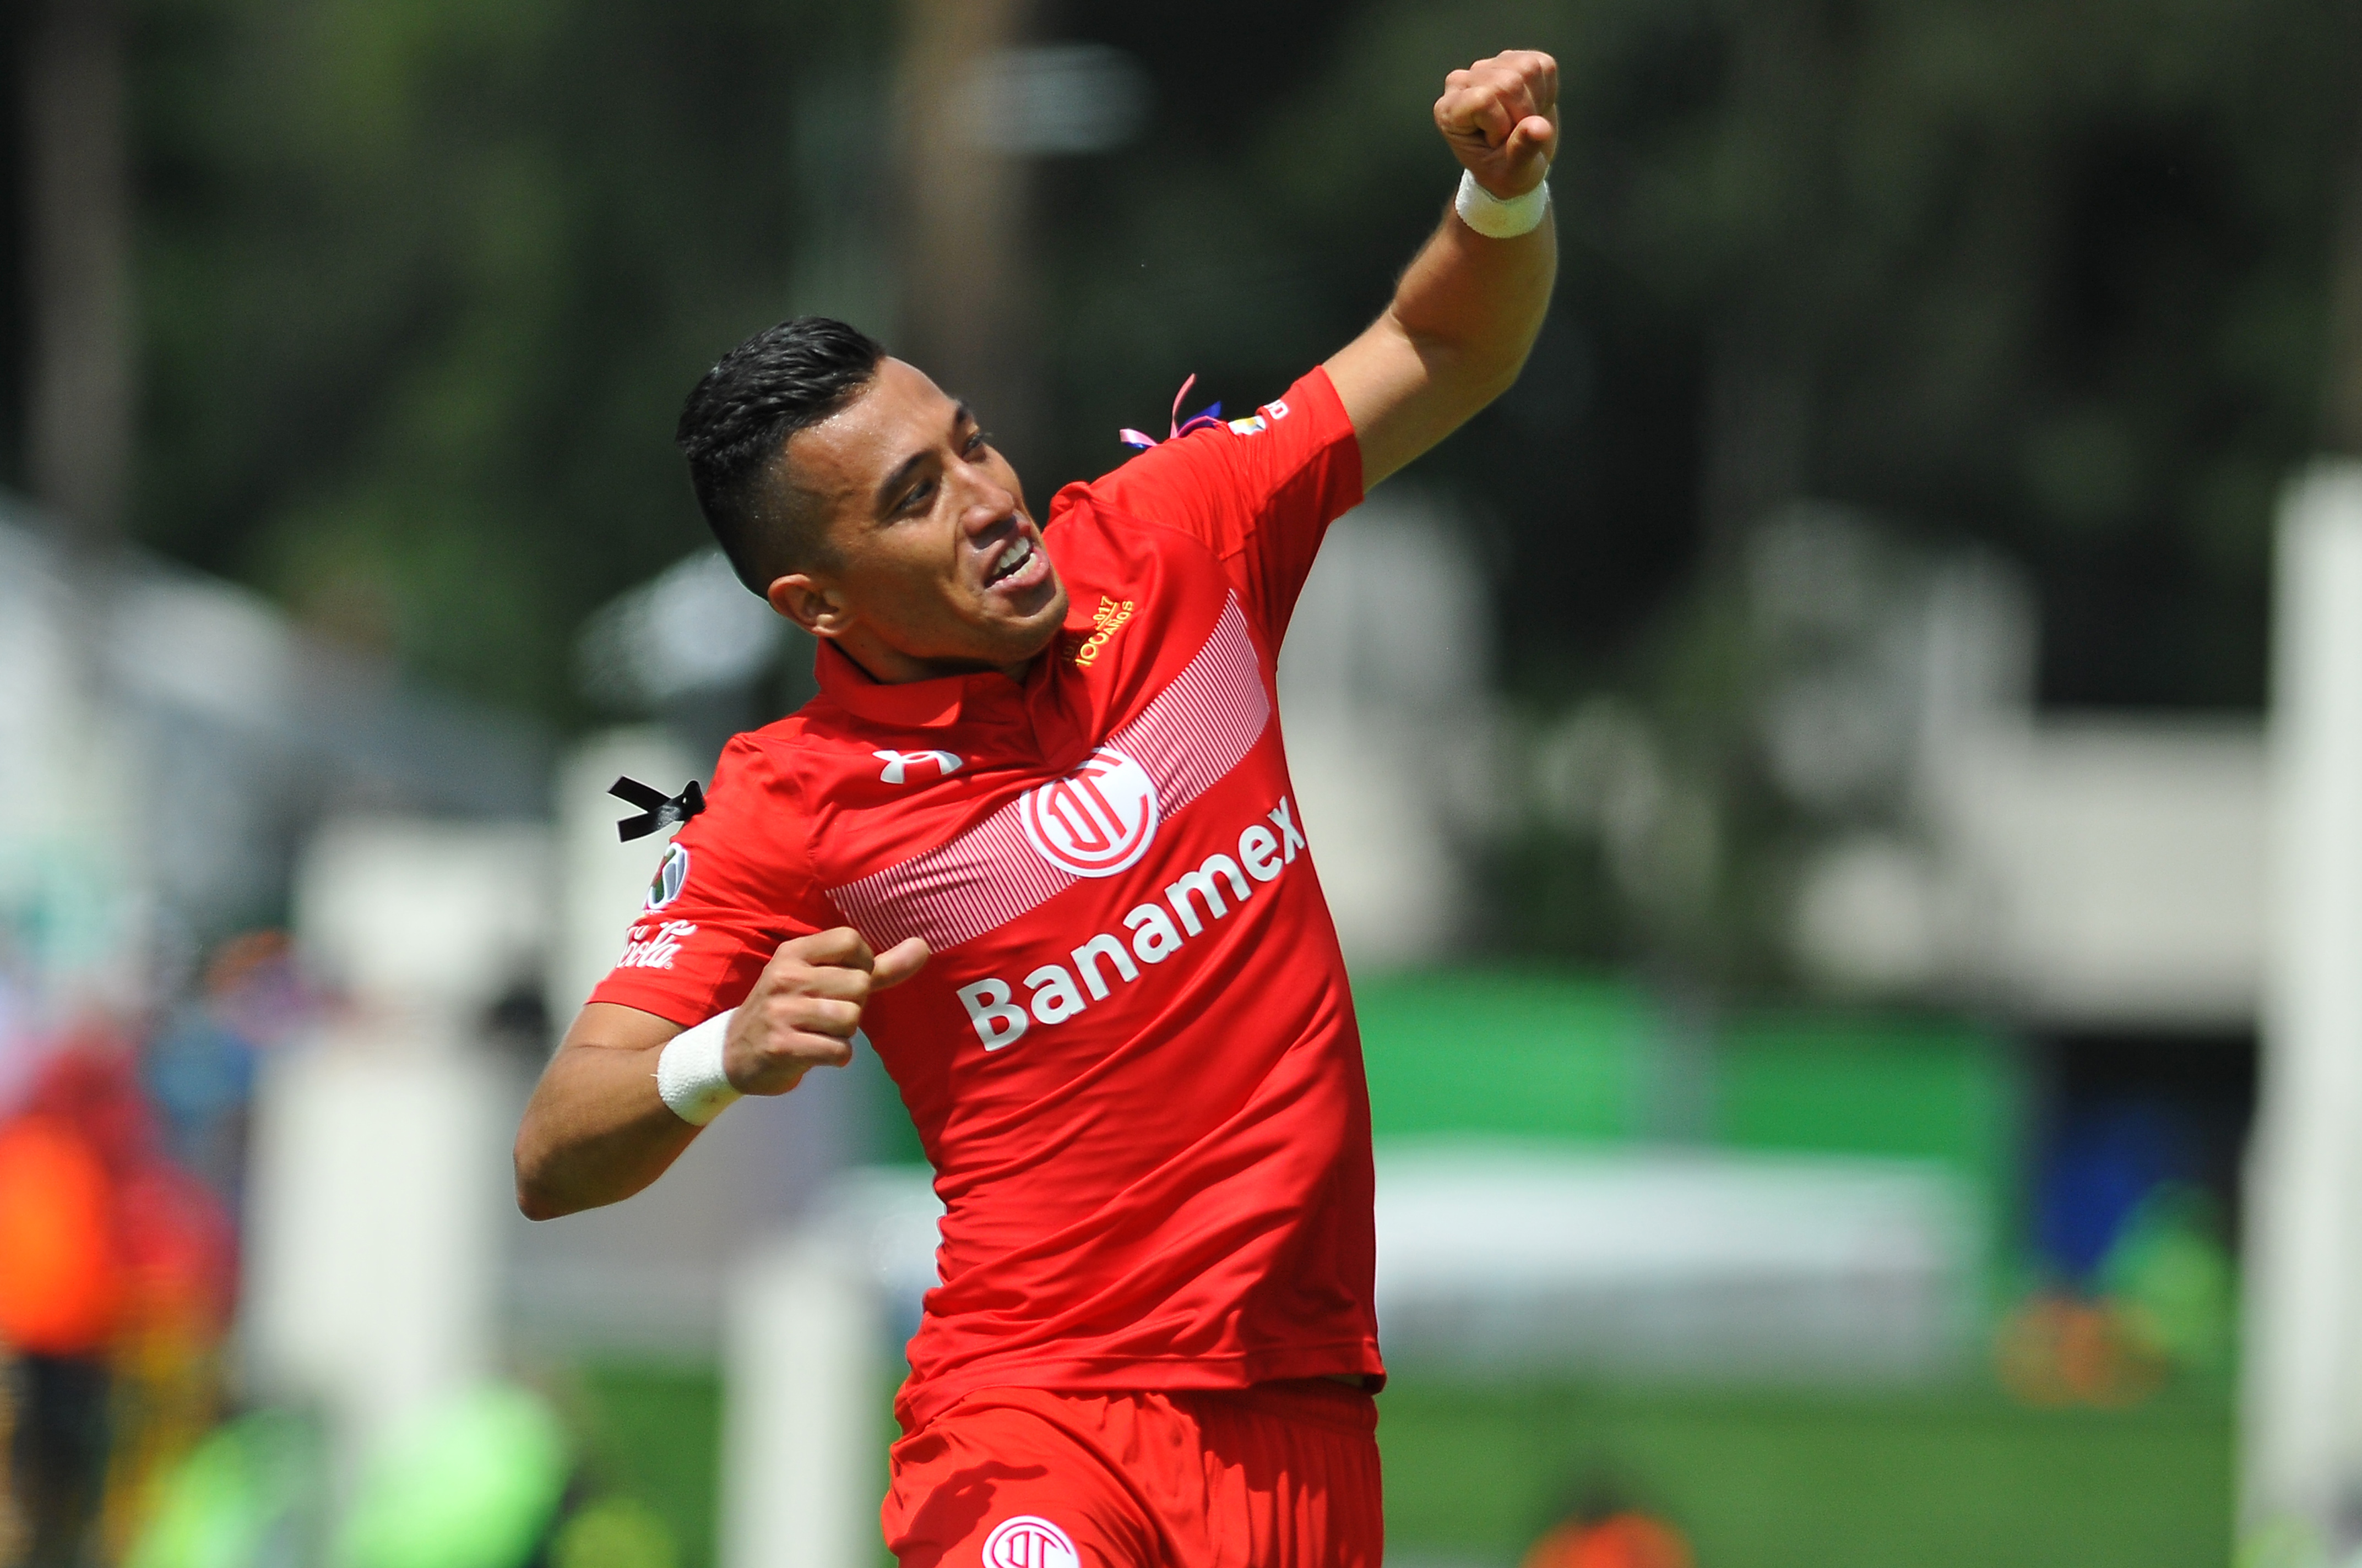 Fernando Uribe de Toluca celebra uno de sus goles.